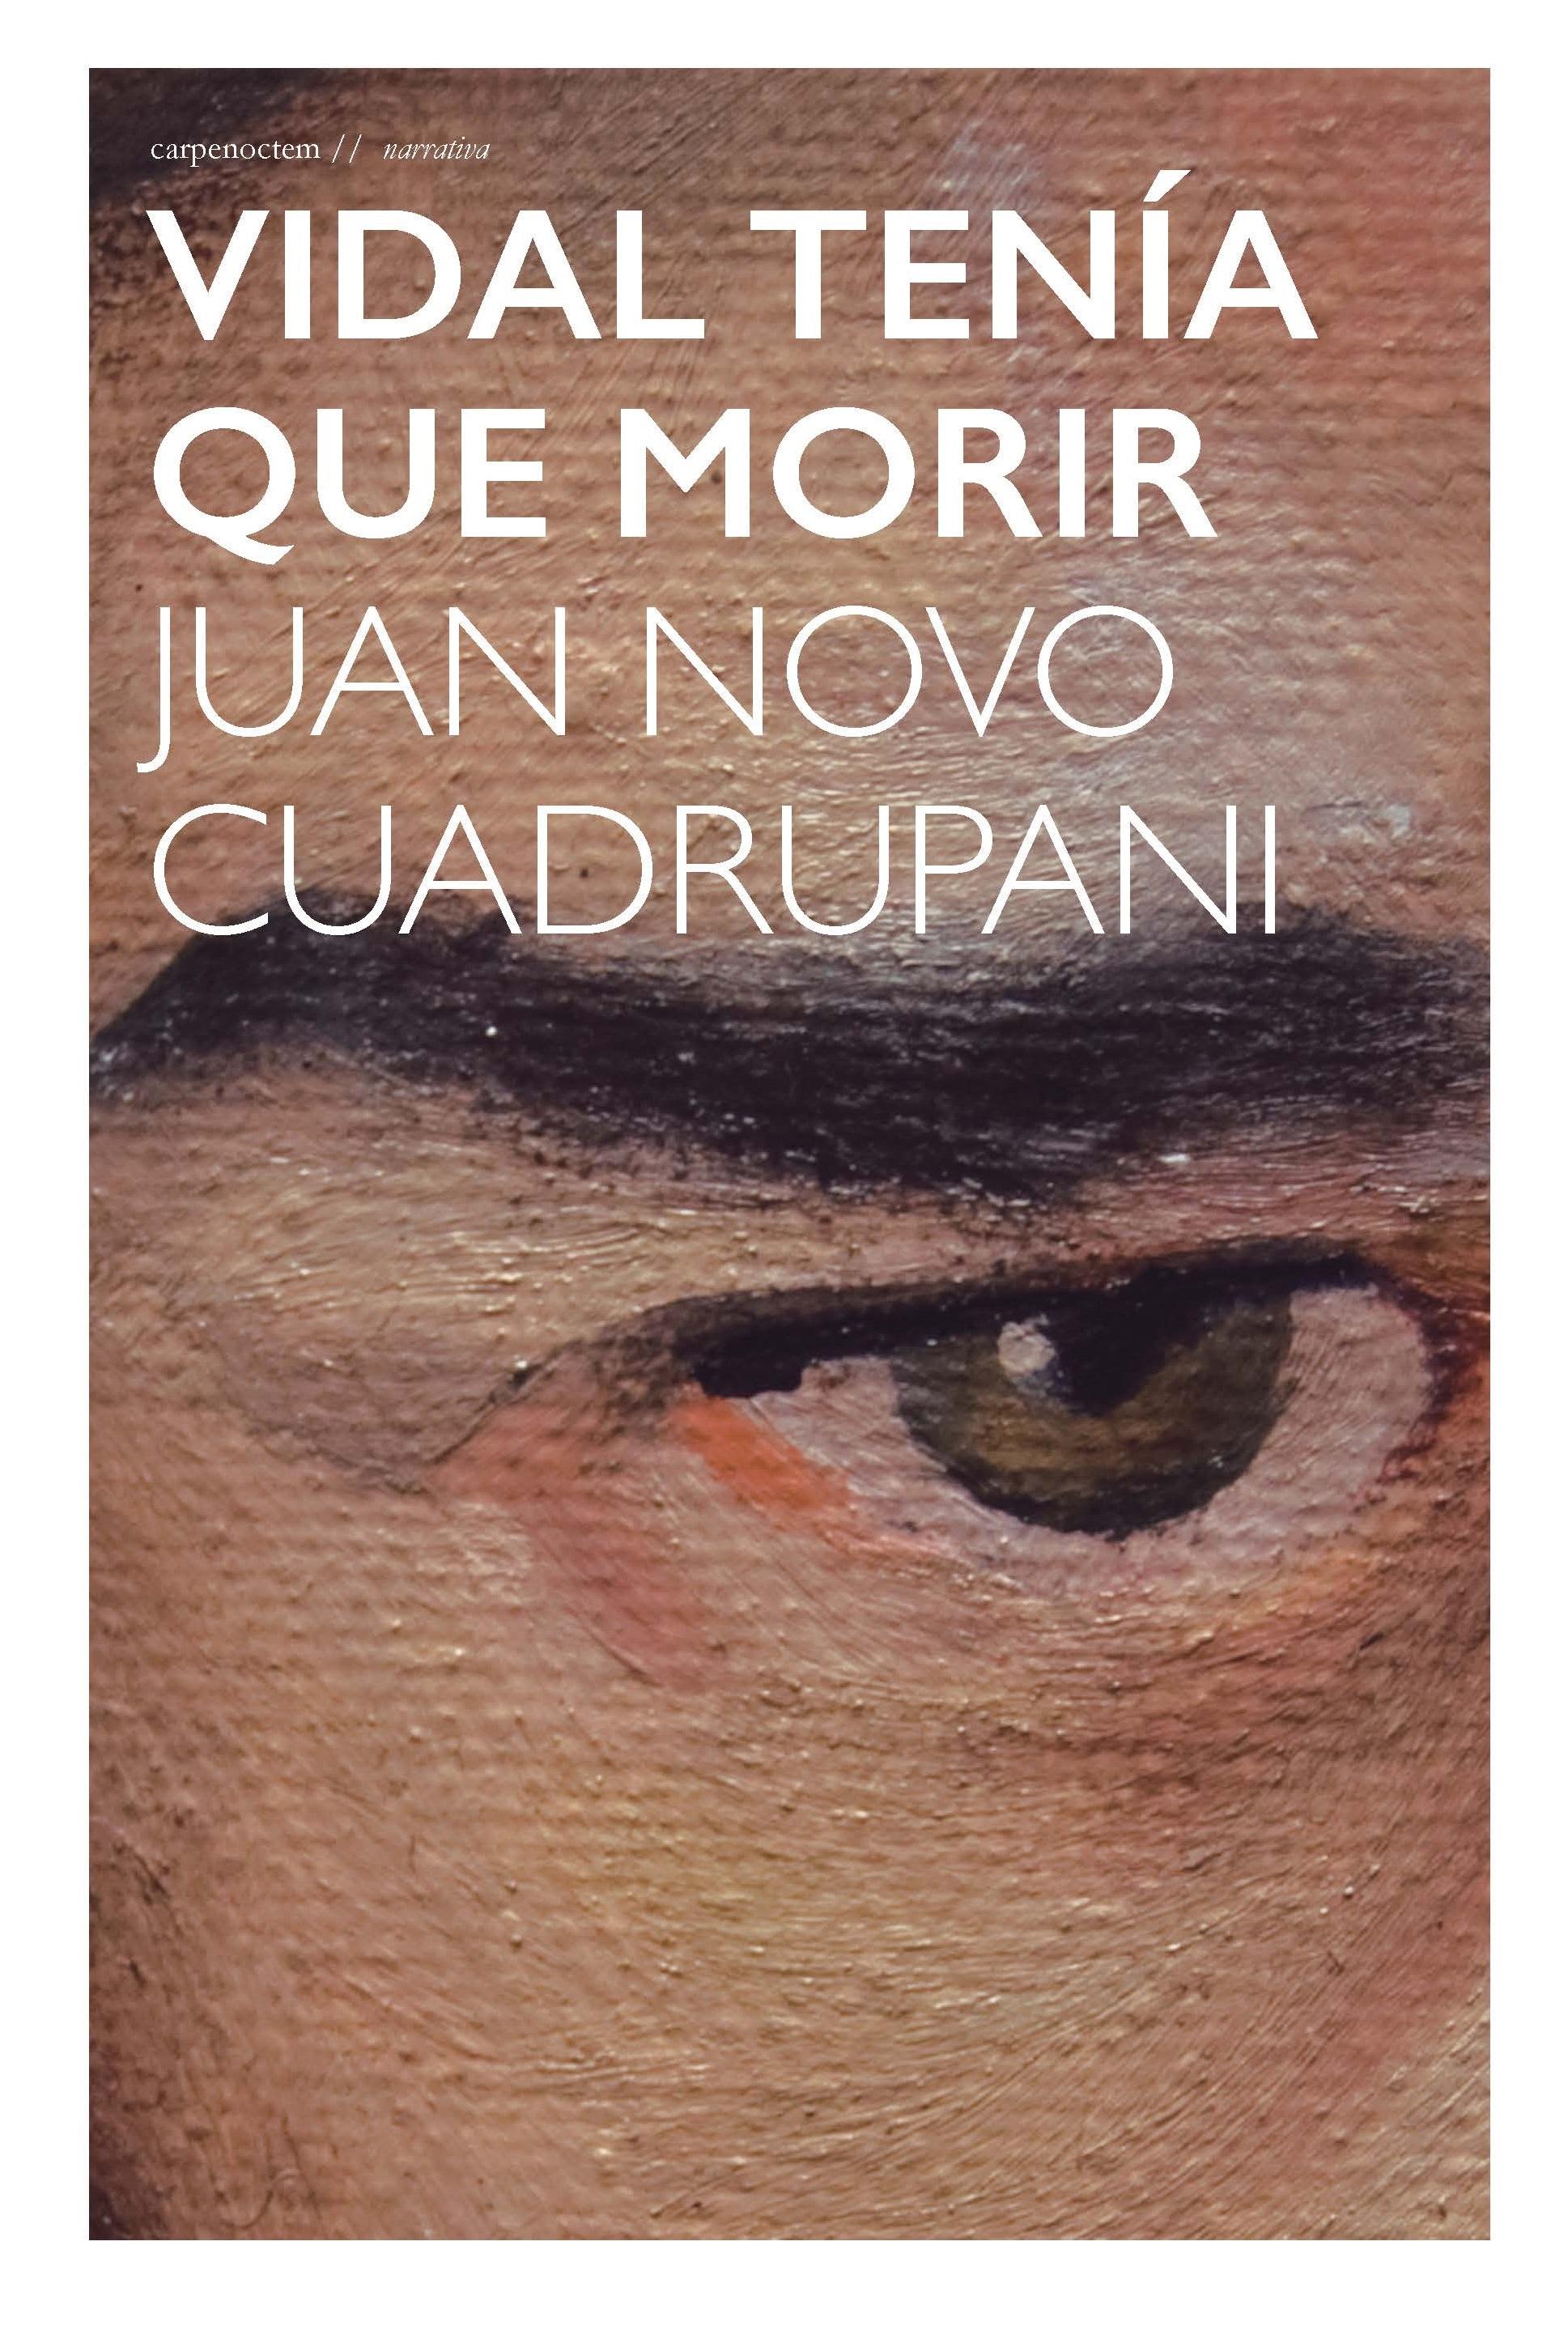 Portada Vidal tenía que morir Juan Novo Cuadrupani